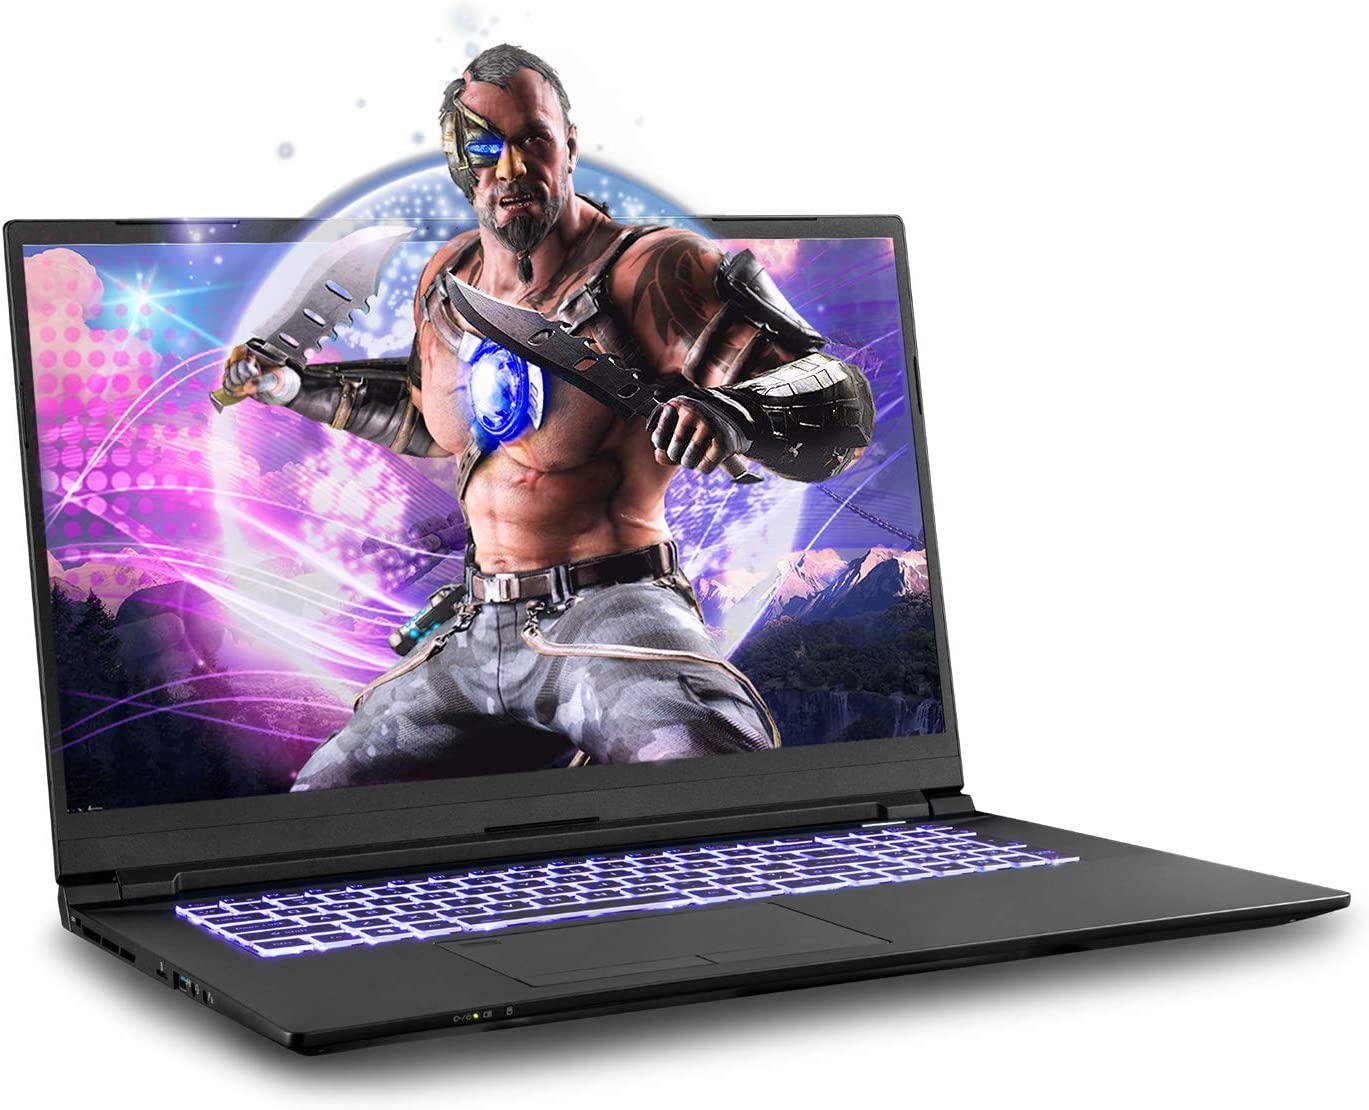 Sager NP8770F1 0.78-Inch Thin, 17.3-Inch FHD 144Hz Gaming Laptop, Intel i7-10875H, RTX 2070, 32GB 3200 RAM, 1TB NVMe SSD, TBT 3, Win 10